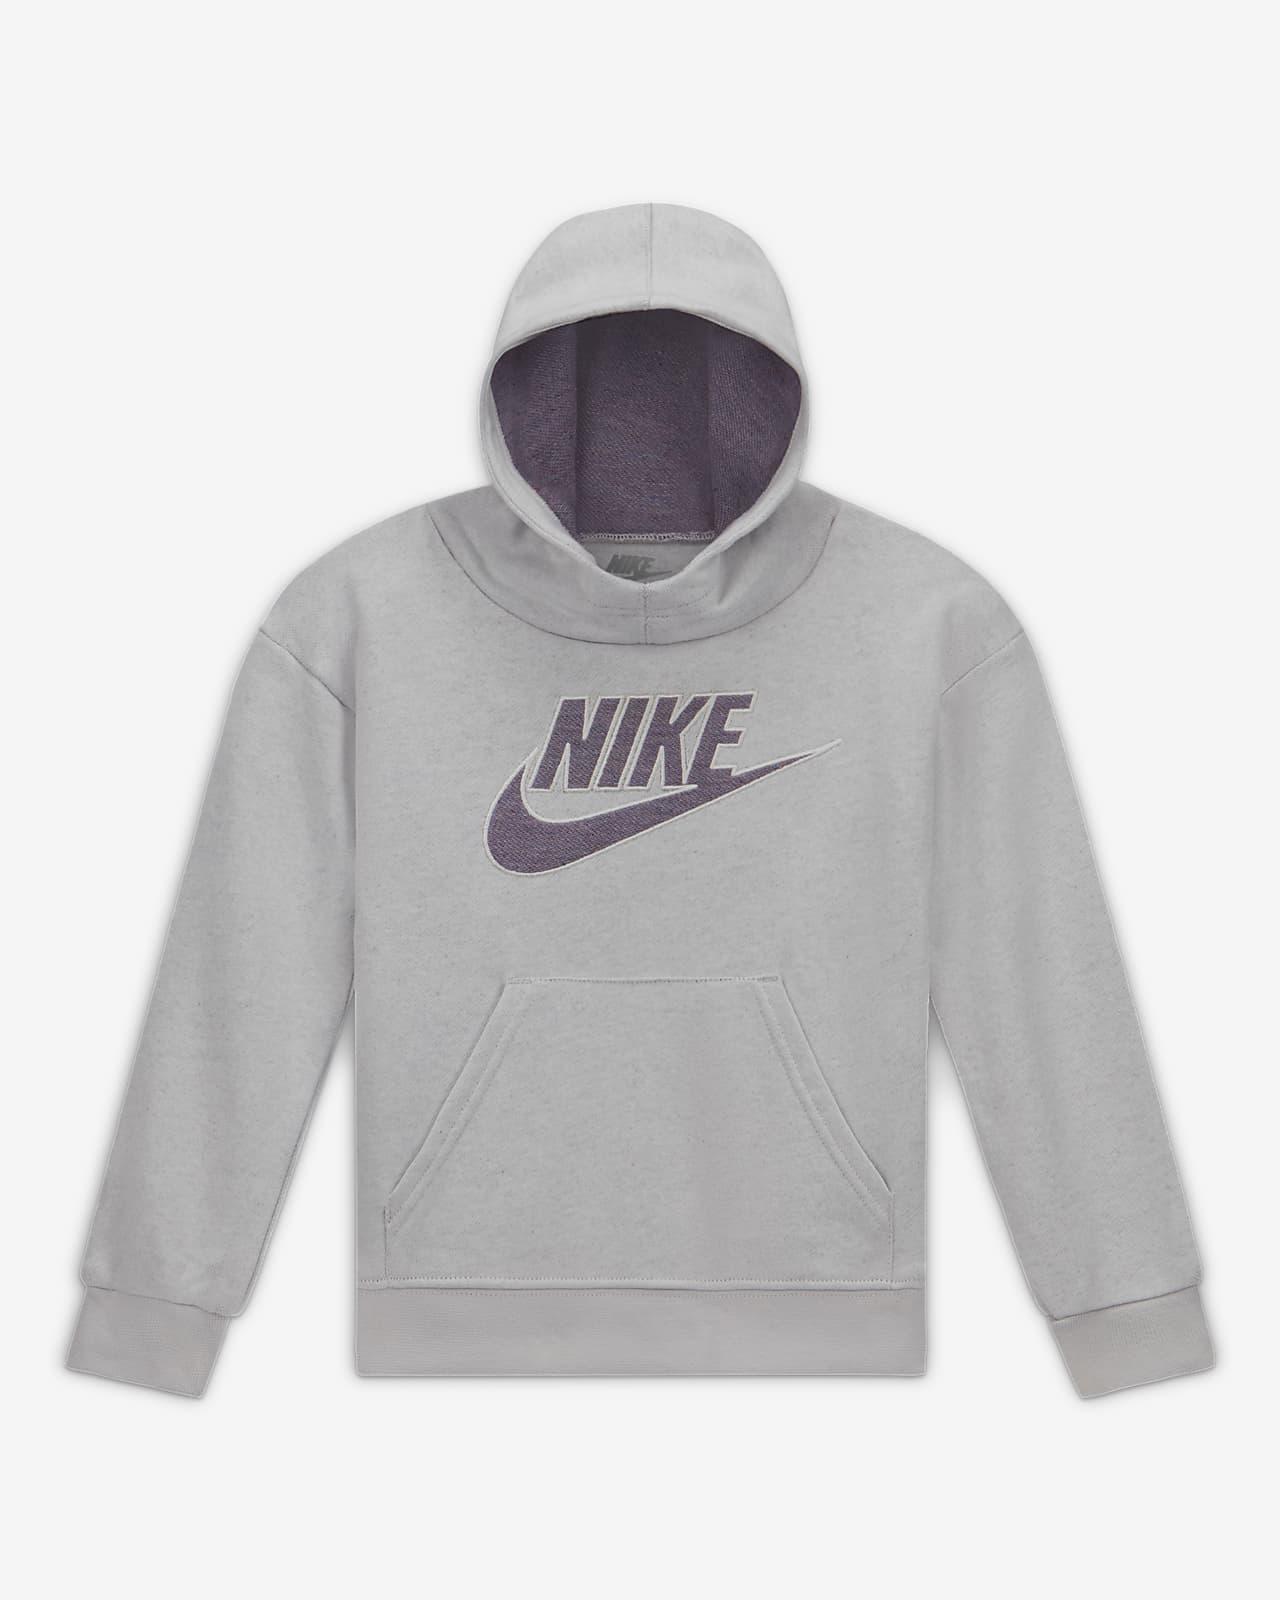 Mikina Nike s kapucí pro batolata